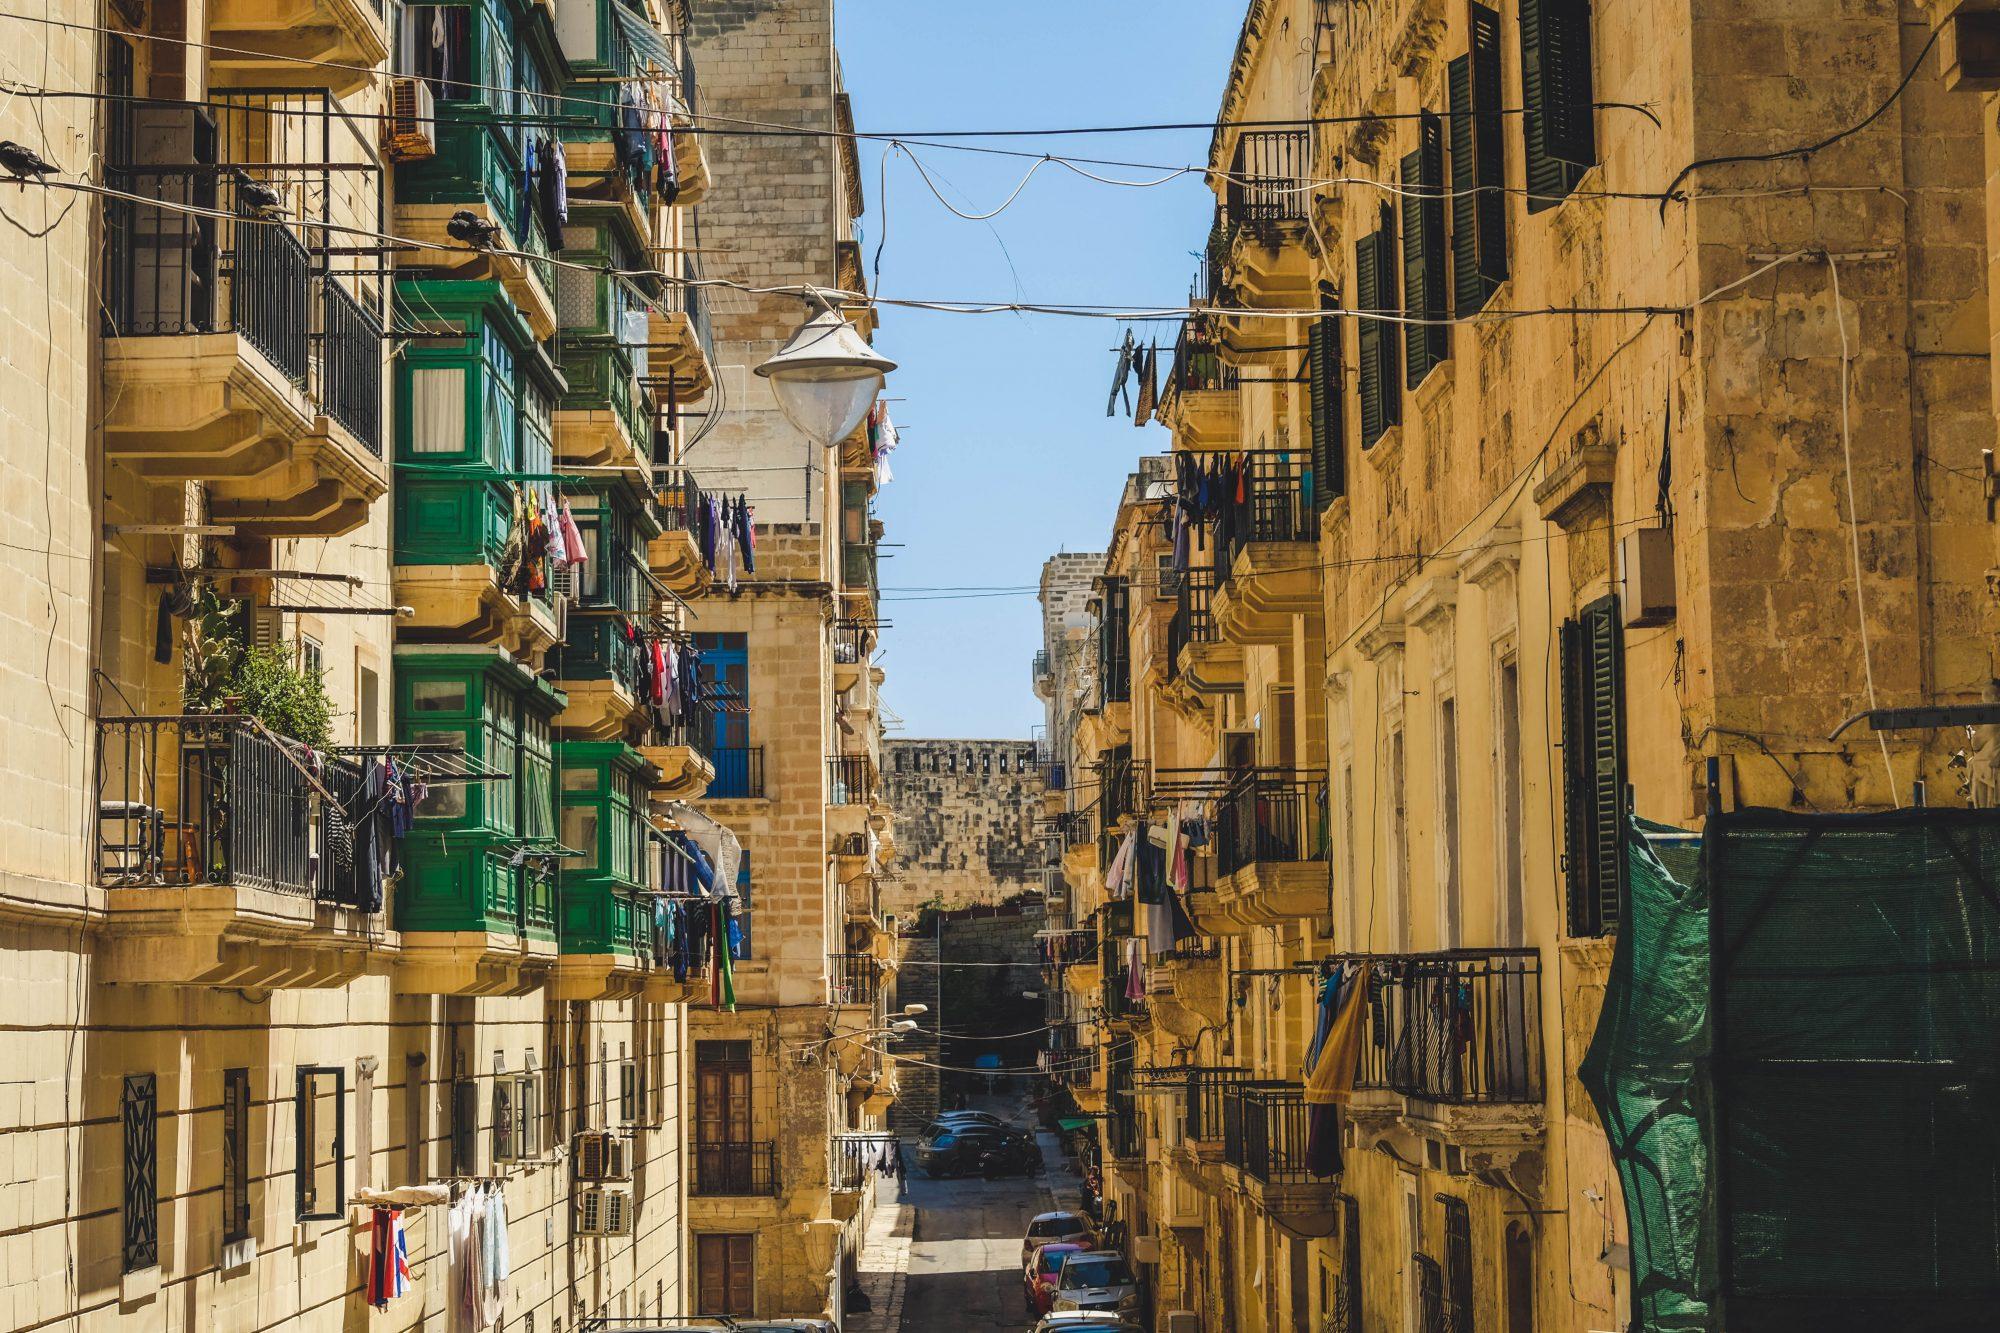 Rue de Malte populaire